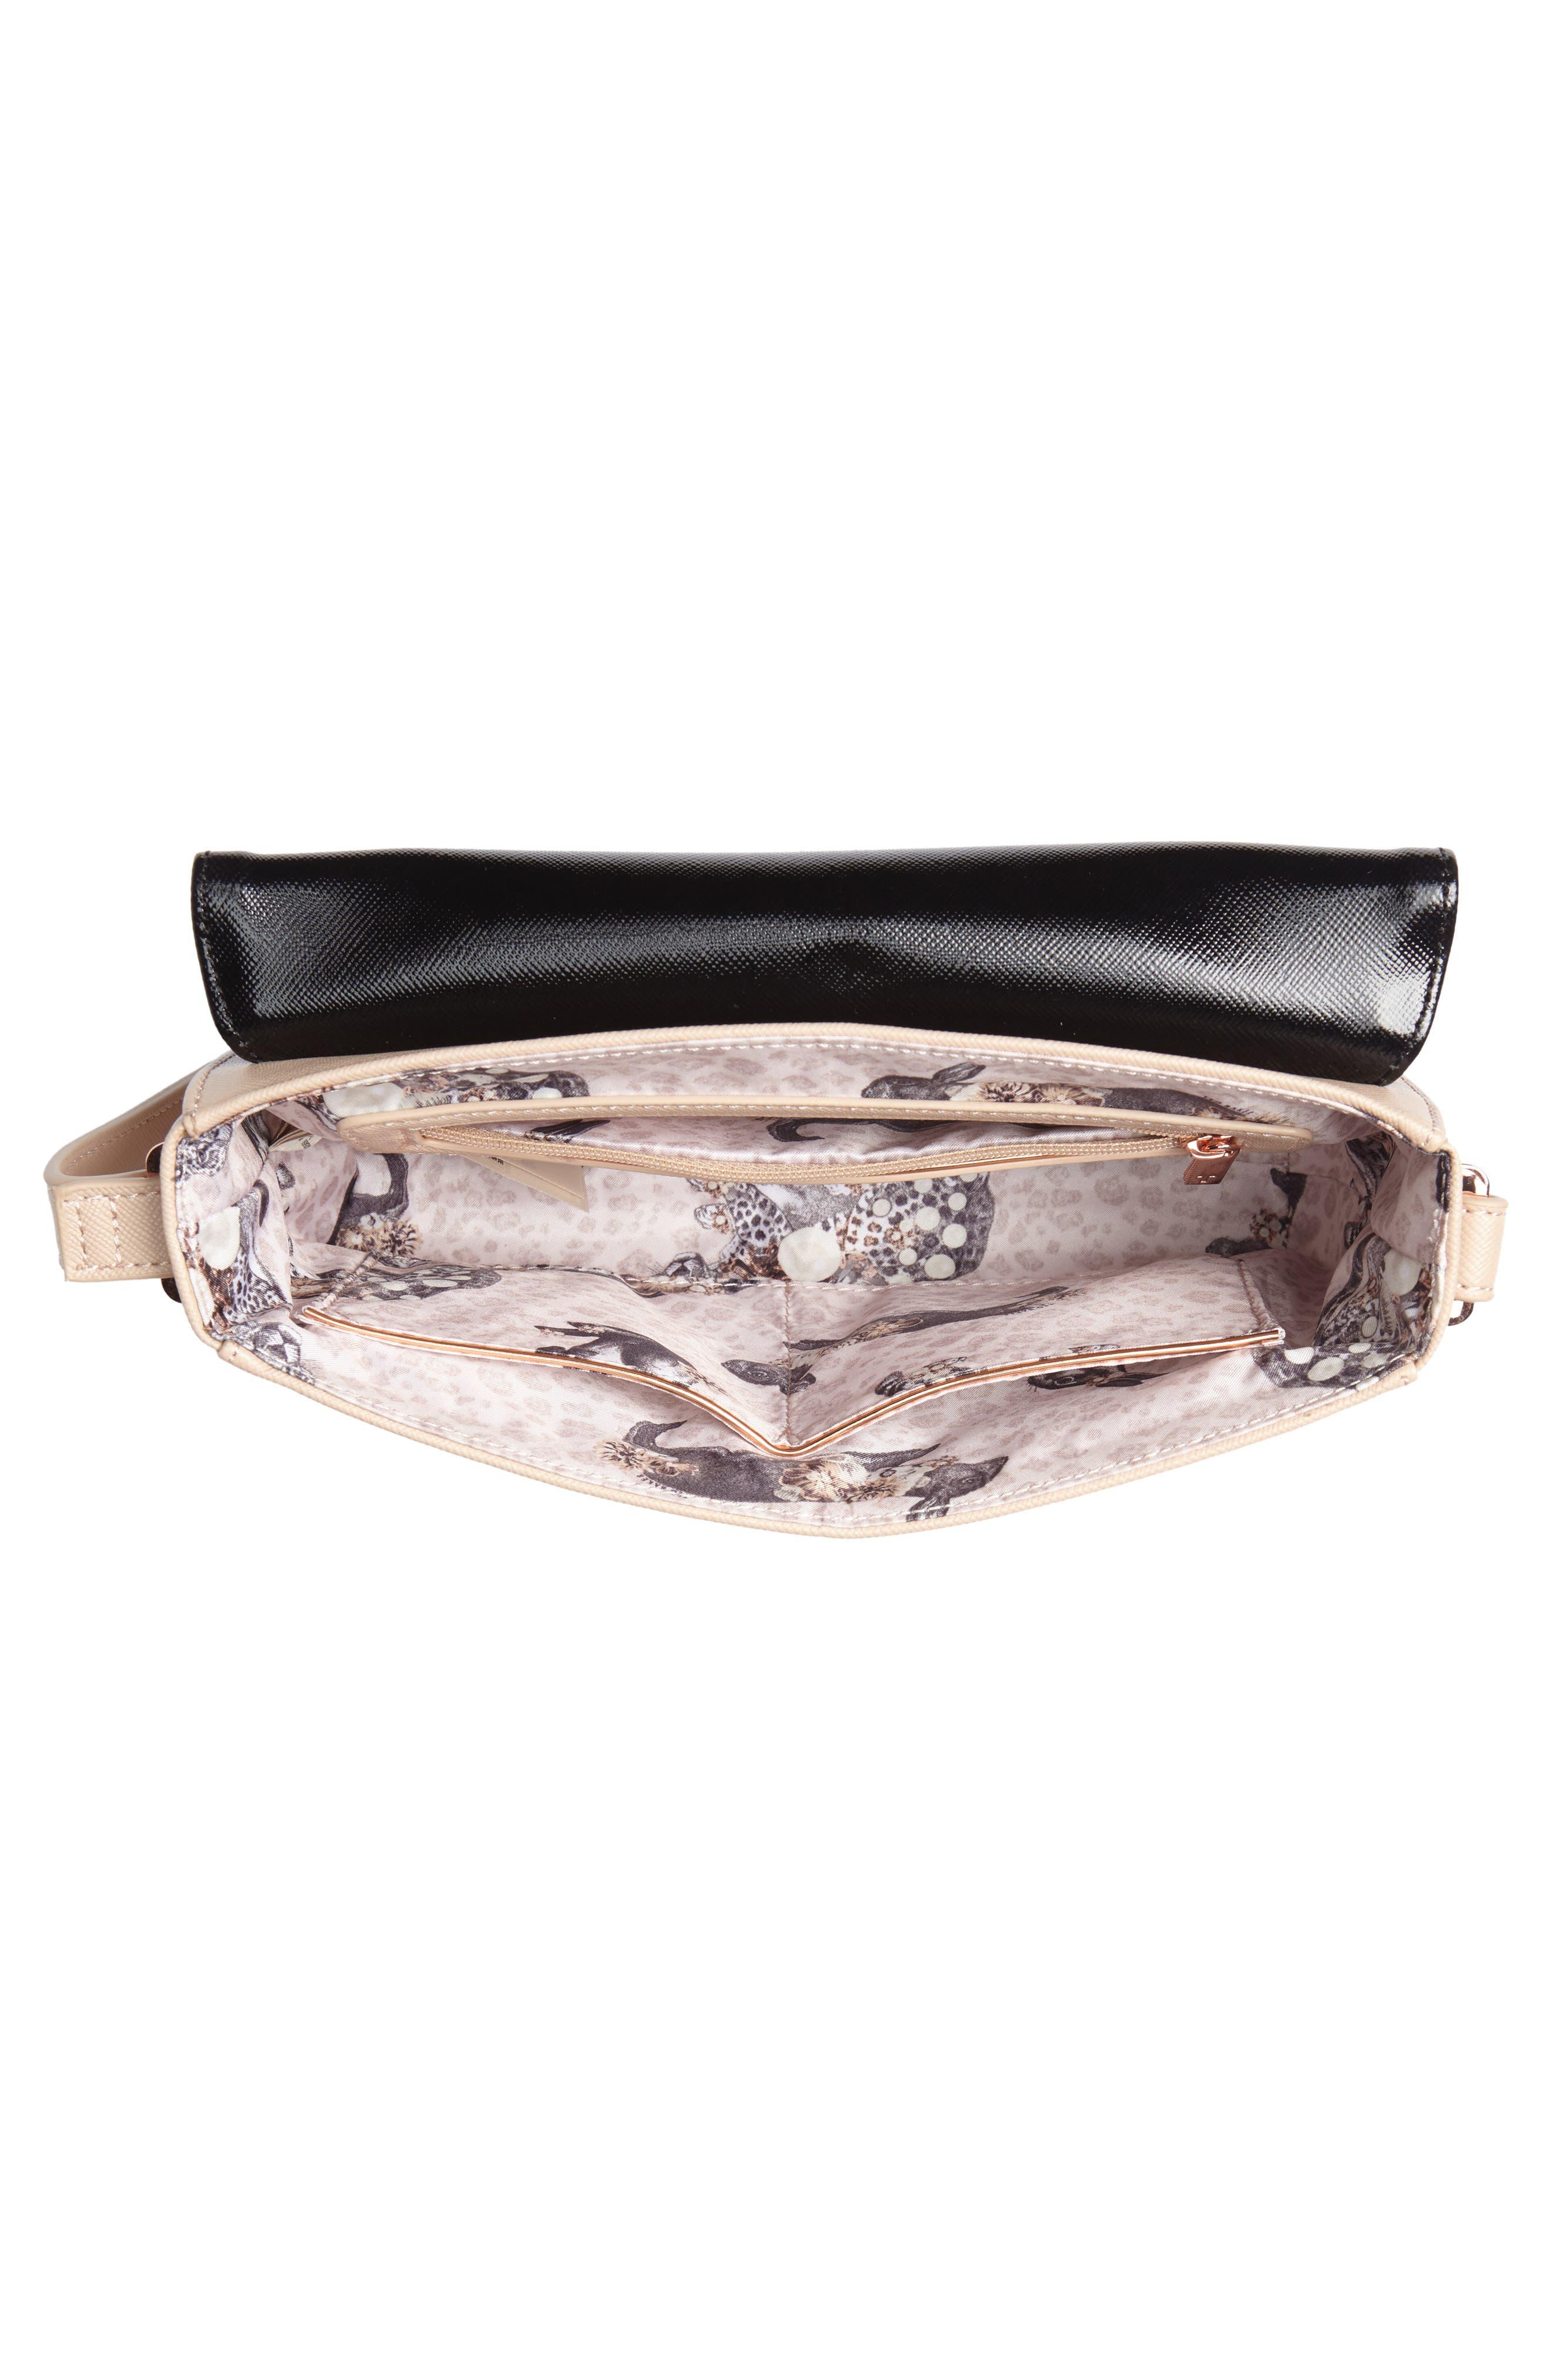 Demonda Faux Leather Crossbody Bag,                             Alternate thumbnail 4, color,                             Taupe